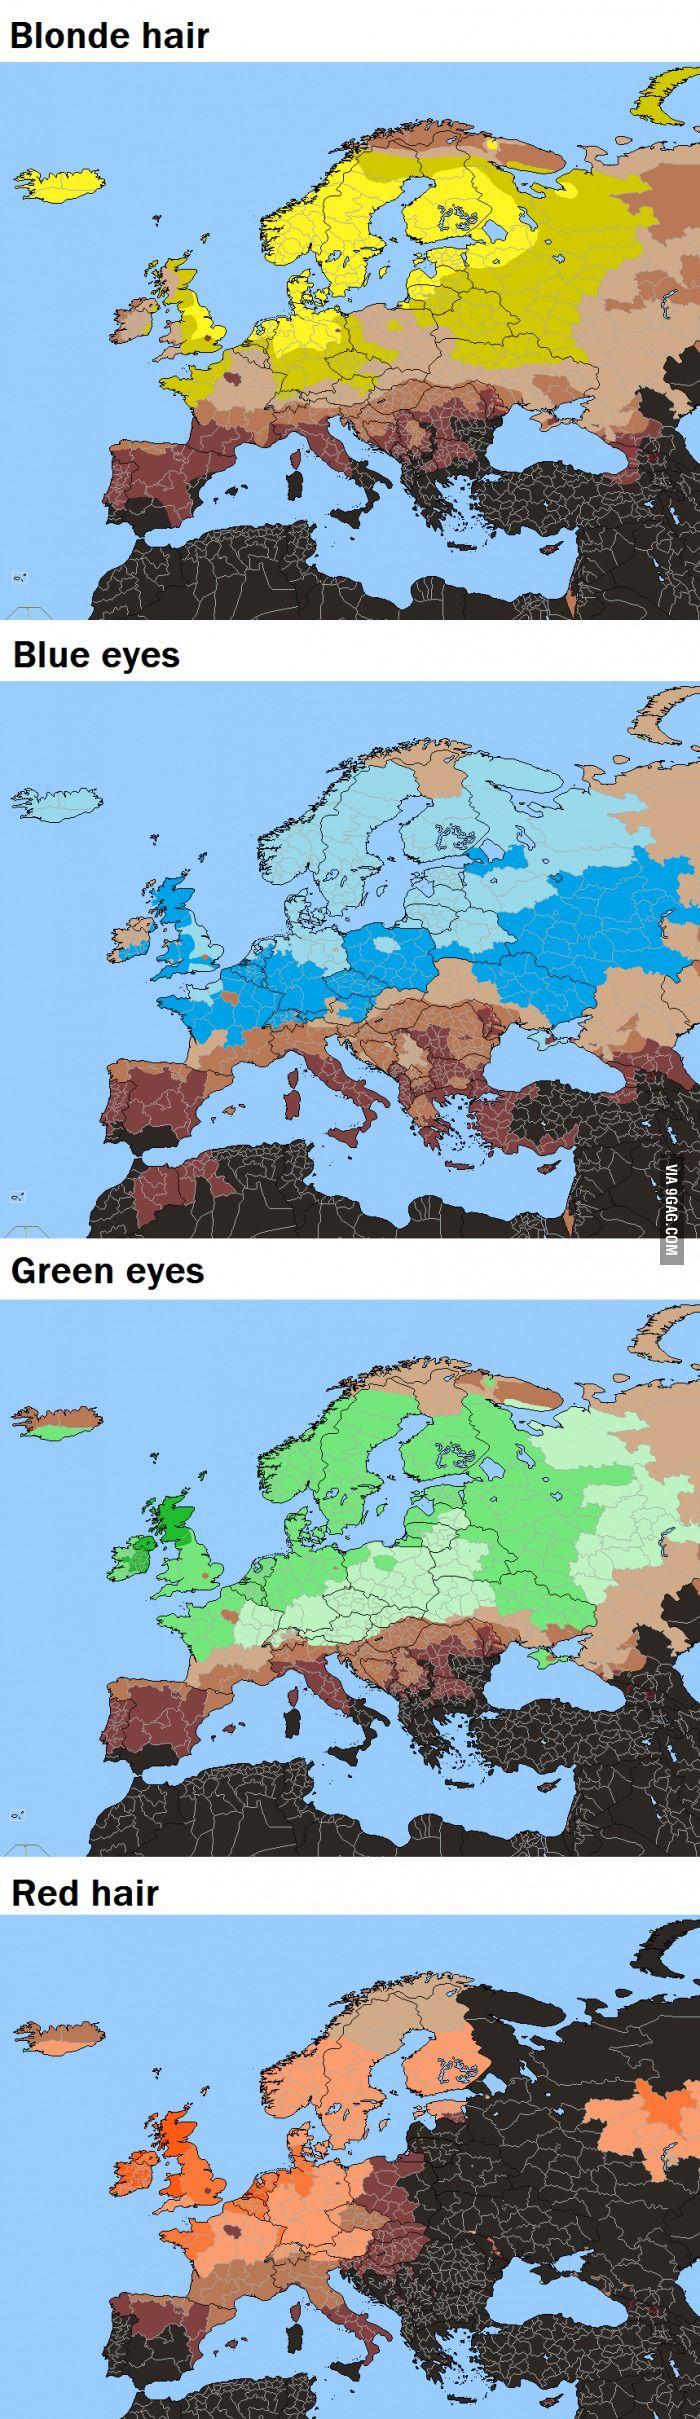 interesting.. Viking / Celt legacies?